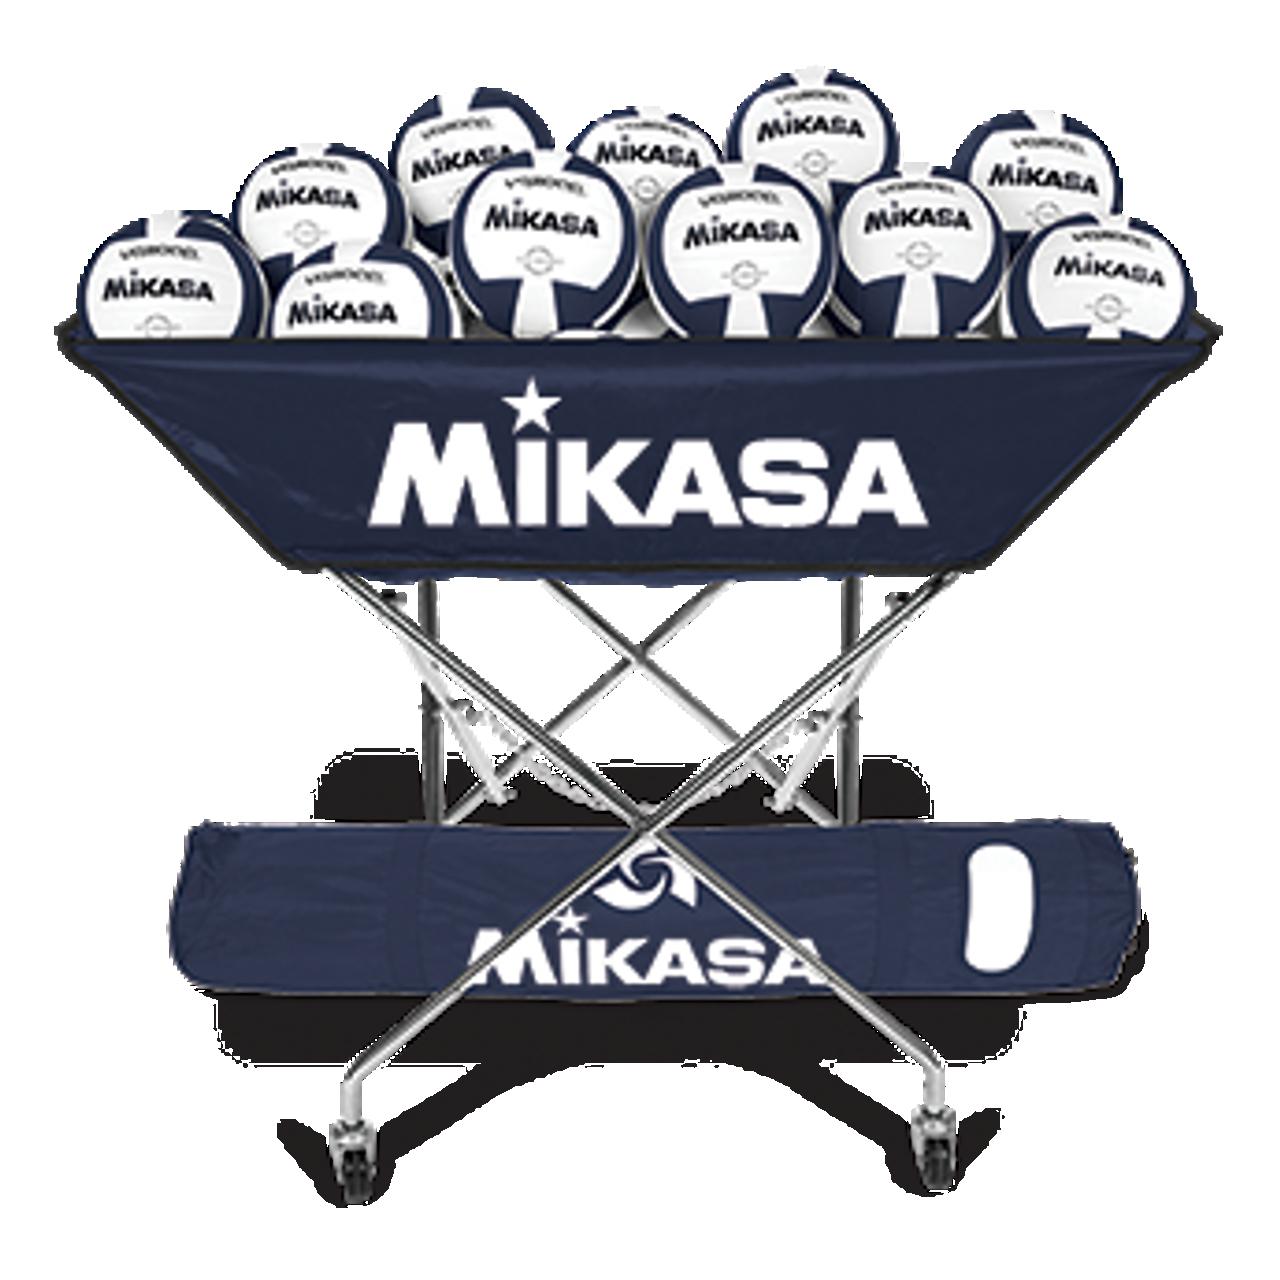 Scarlet Tachikara Hammock Volleyball Cart with Nylon Carry Bag